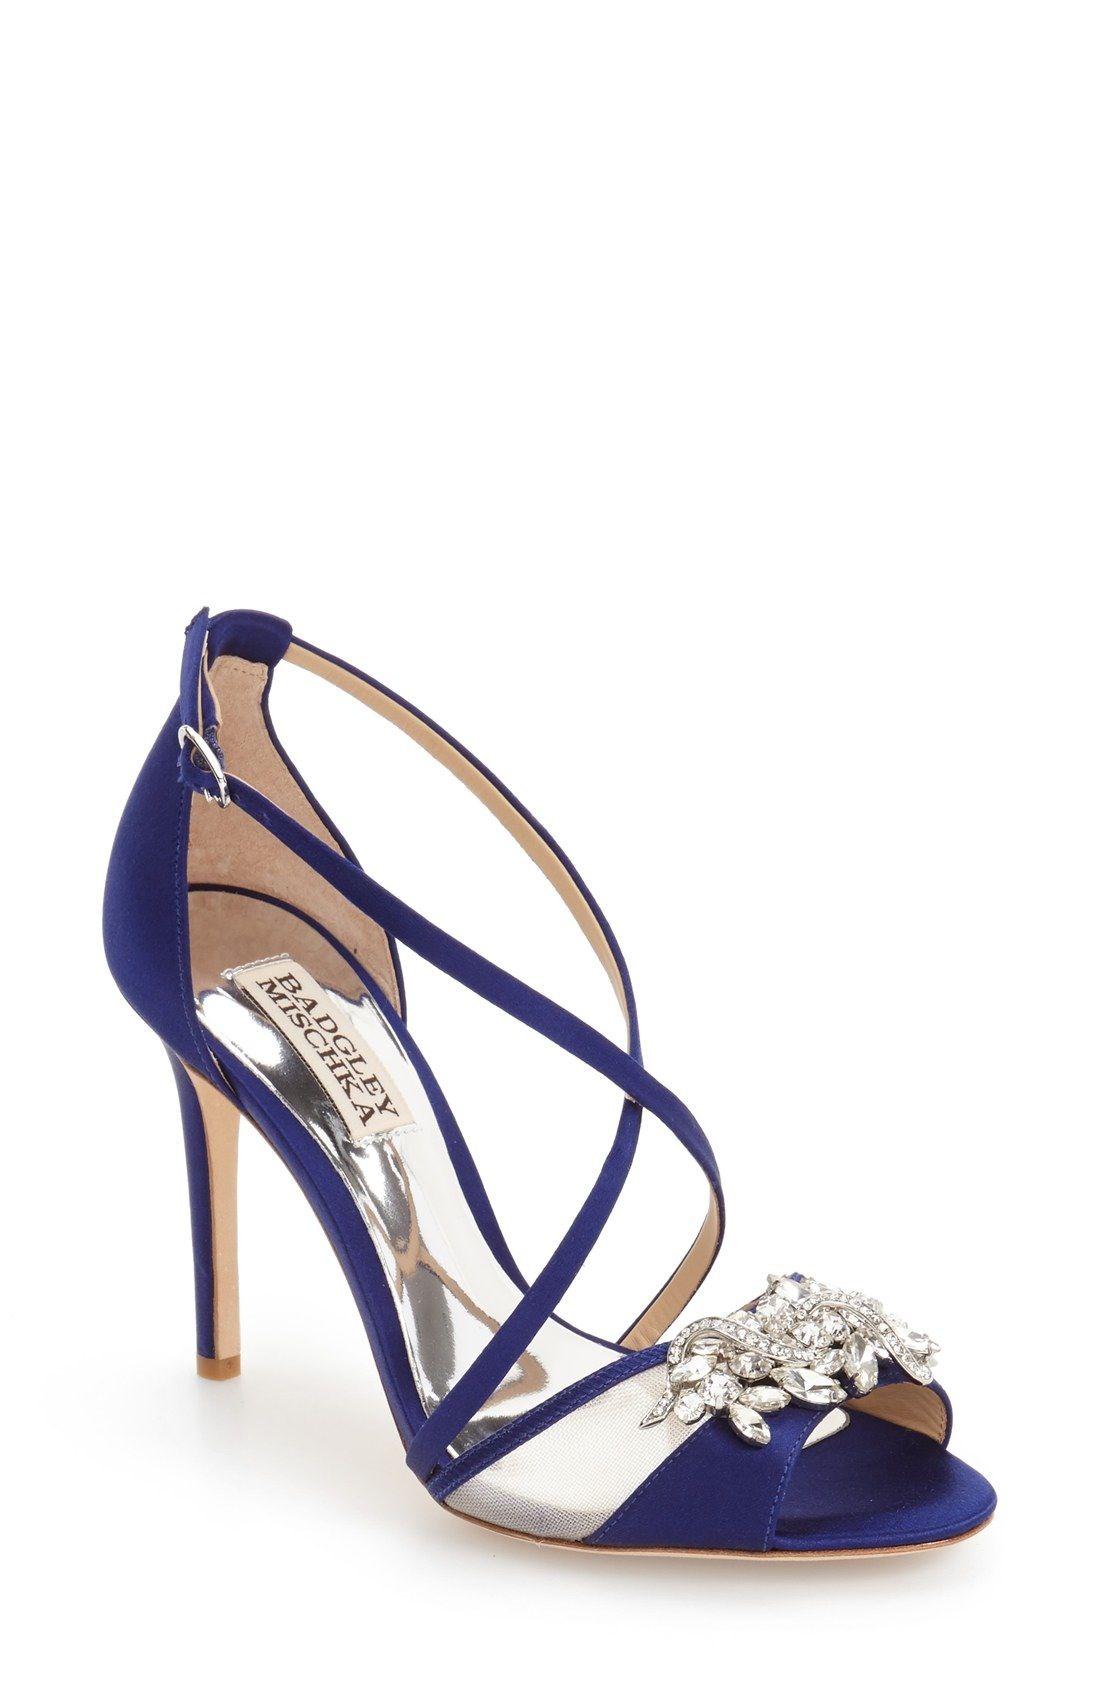 7d9c657e298 Badgley Mischka  Gala  Crystal Embellished Evening Sandal (Women) available  at  Nordstrom